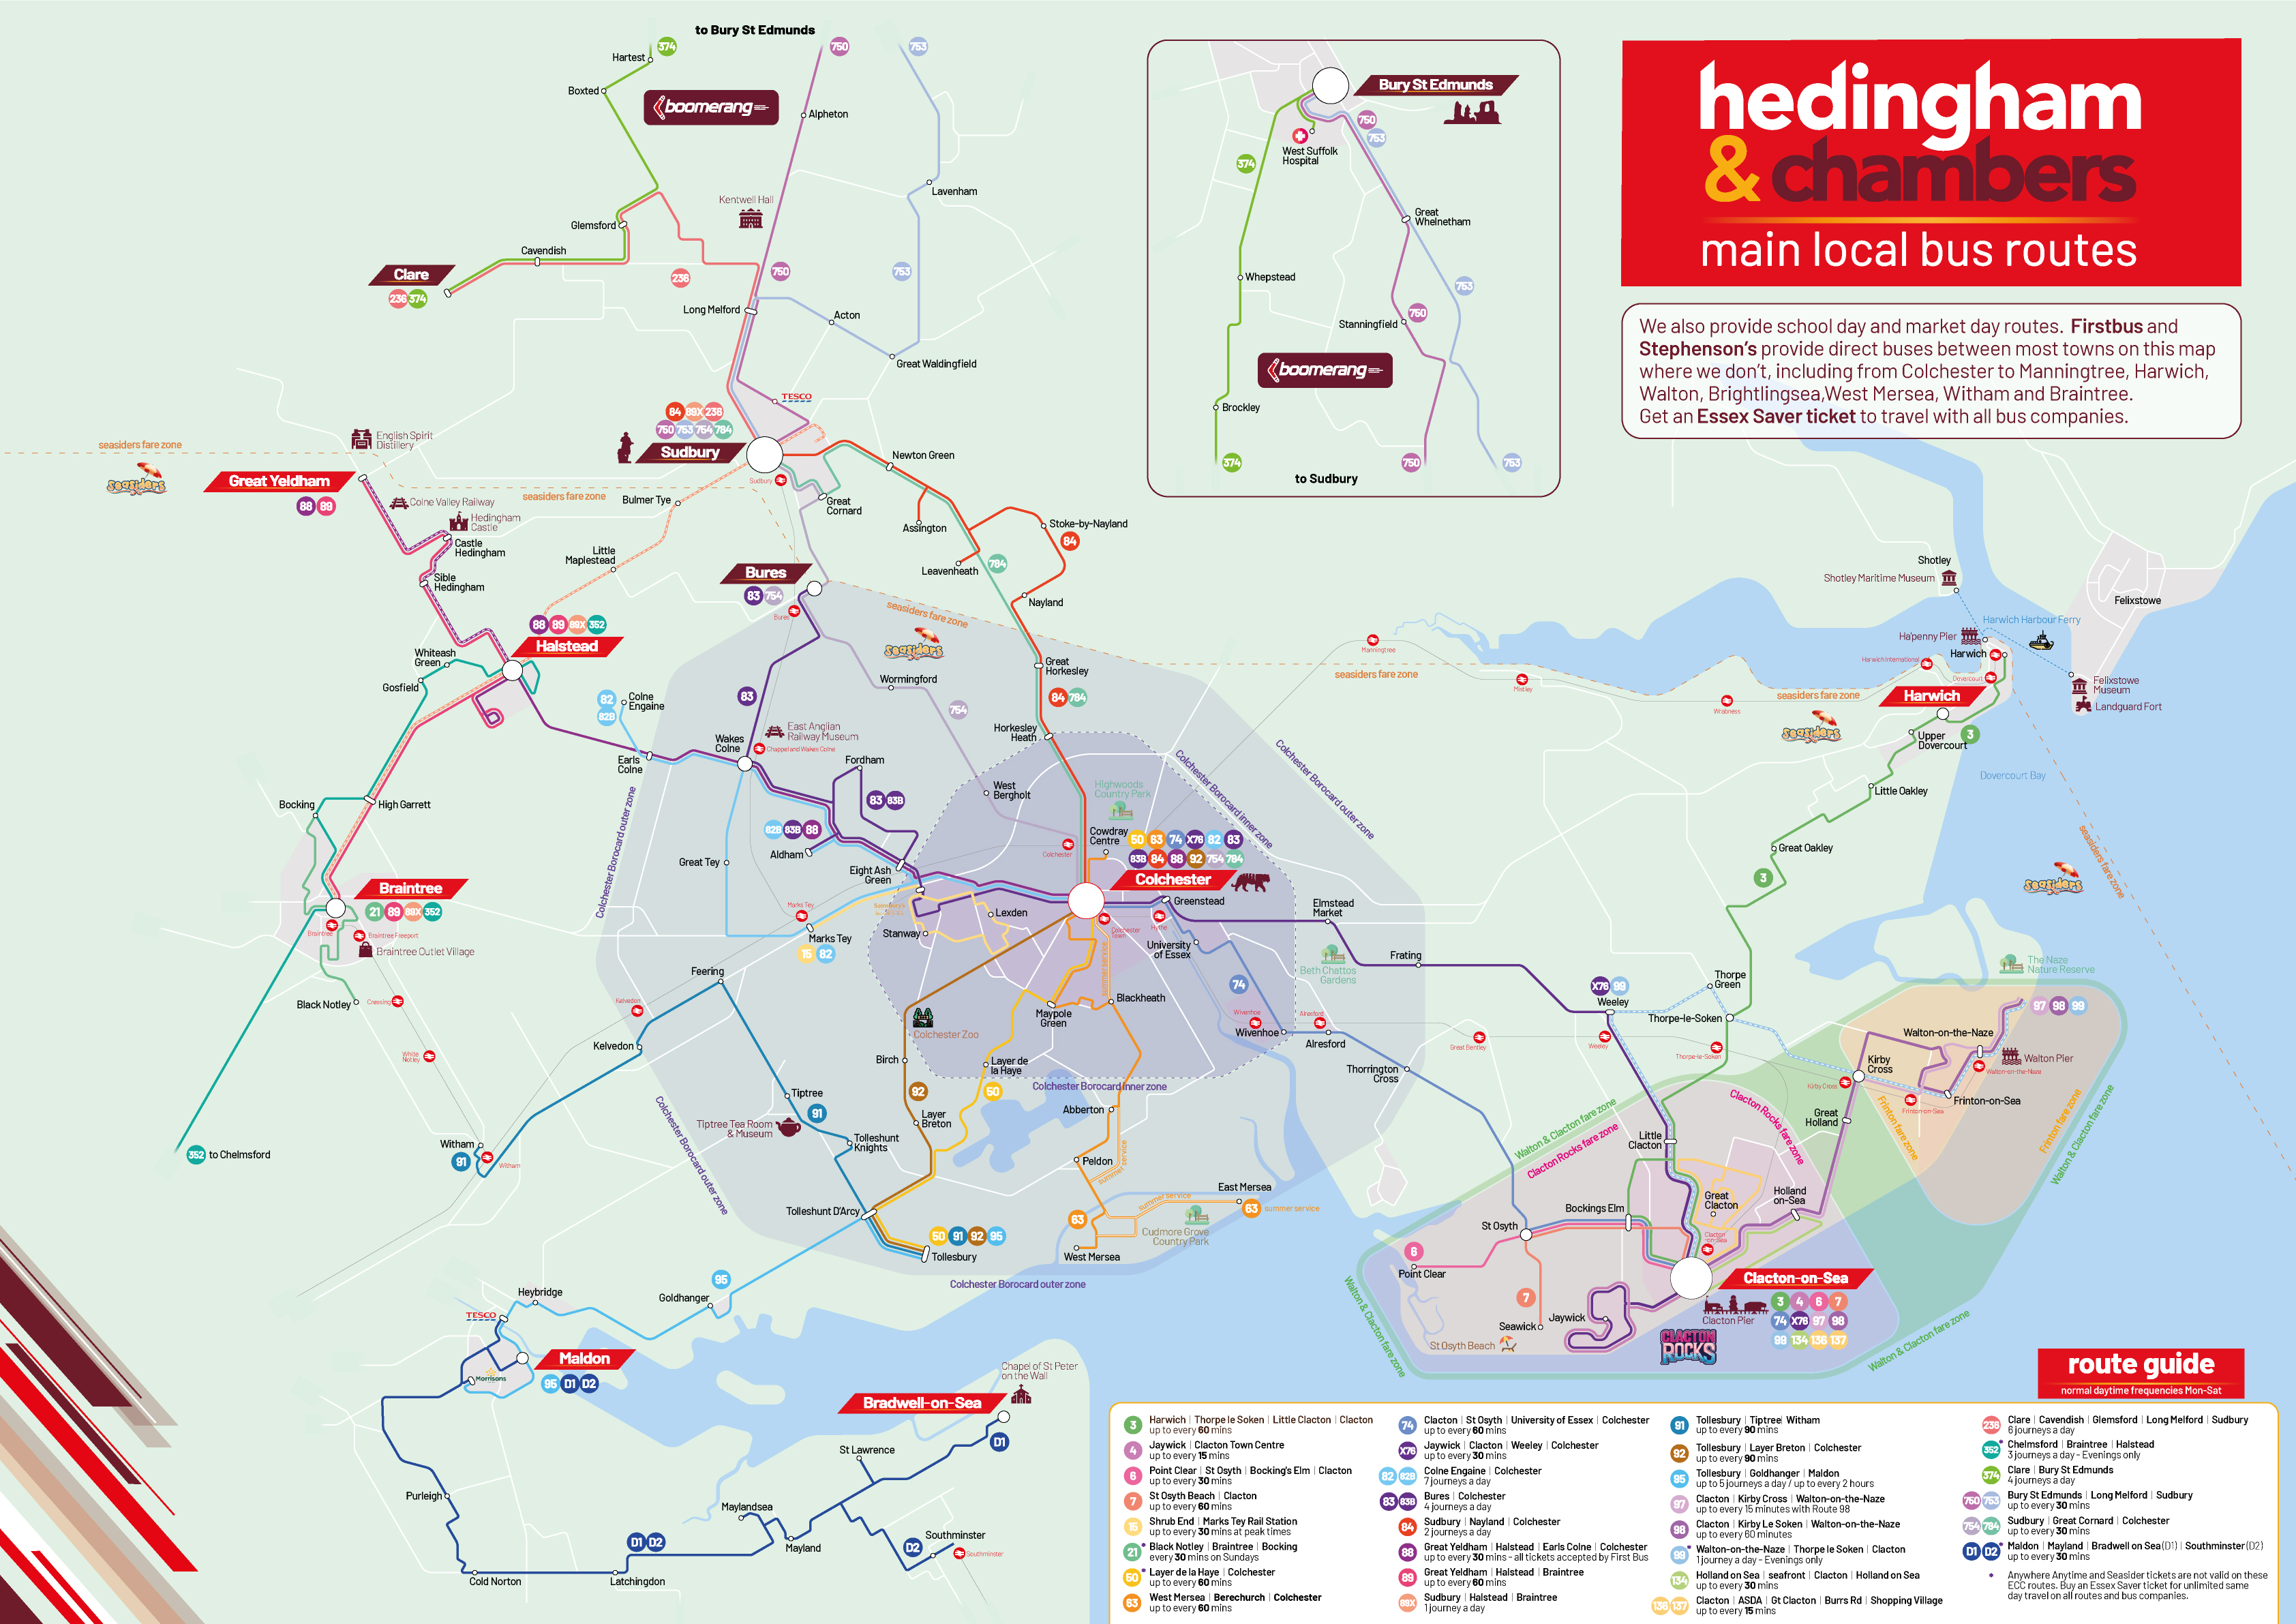 Image shows Hedingham Fare Zones